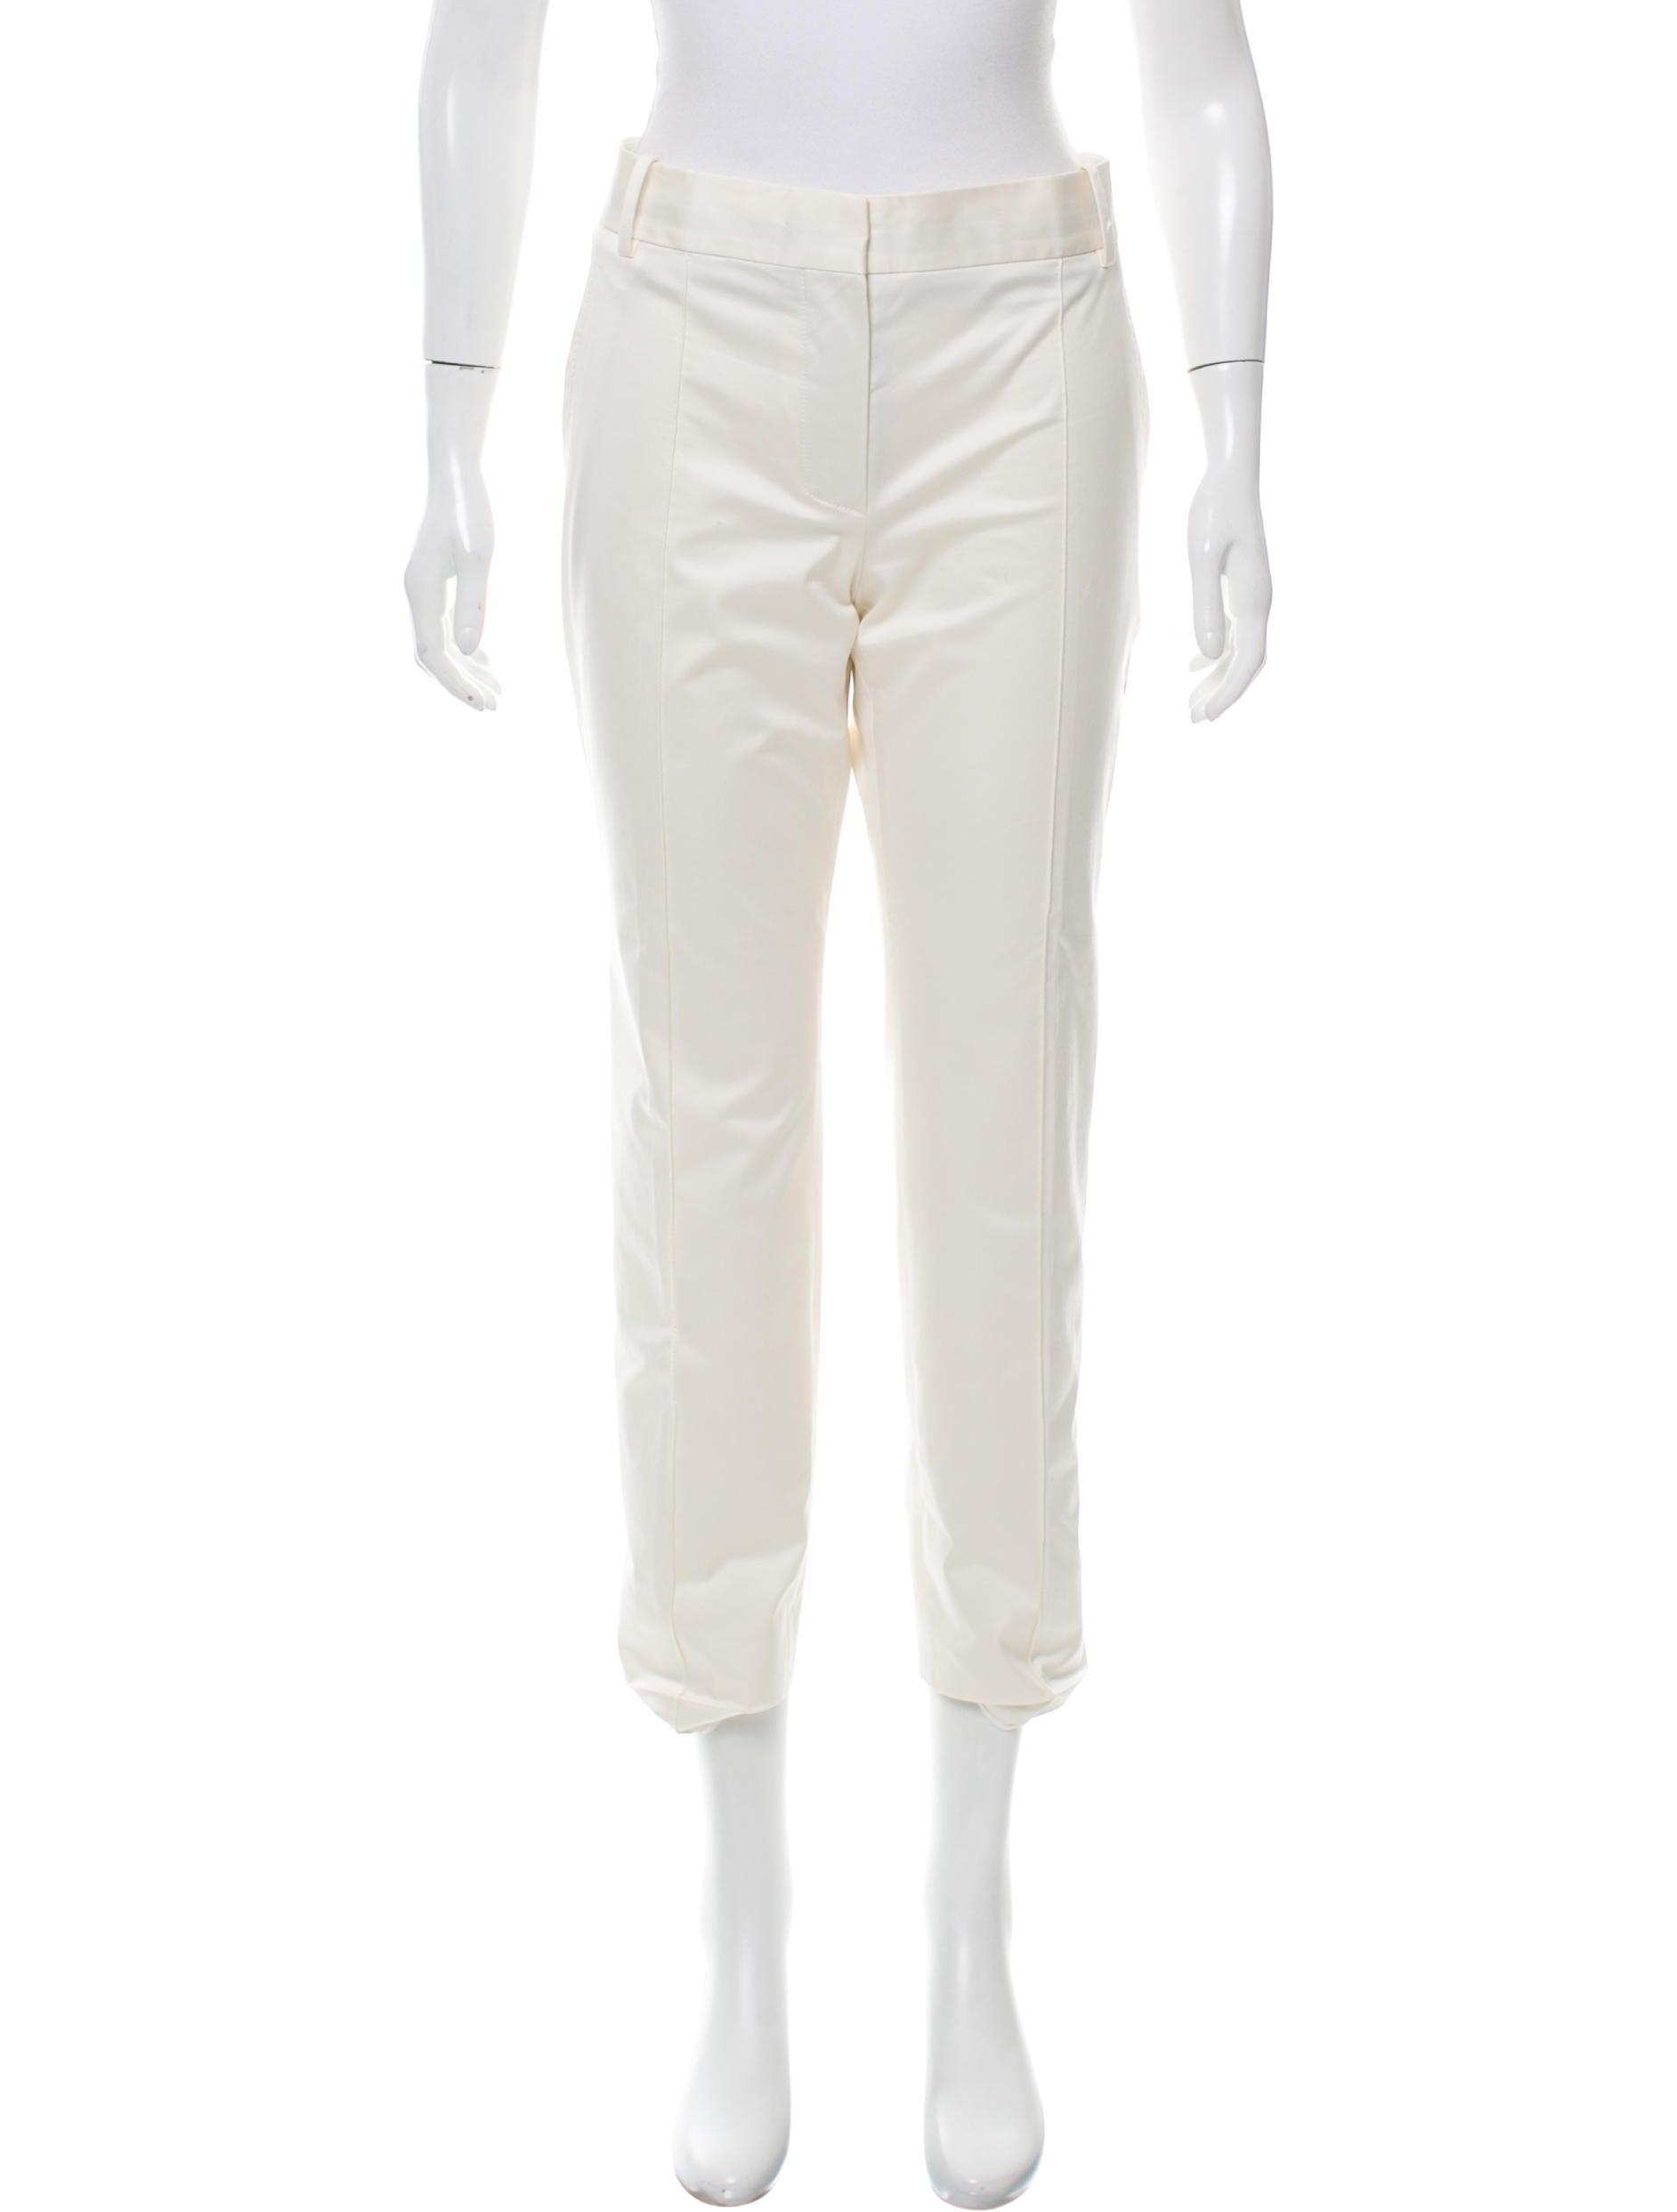 Beautiful Louis Vuitton Cropped StraightLeg Pants  Pants  LOU58243  The